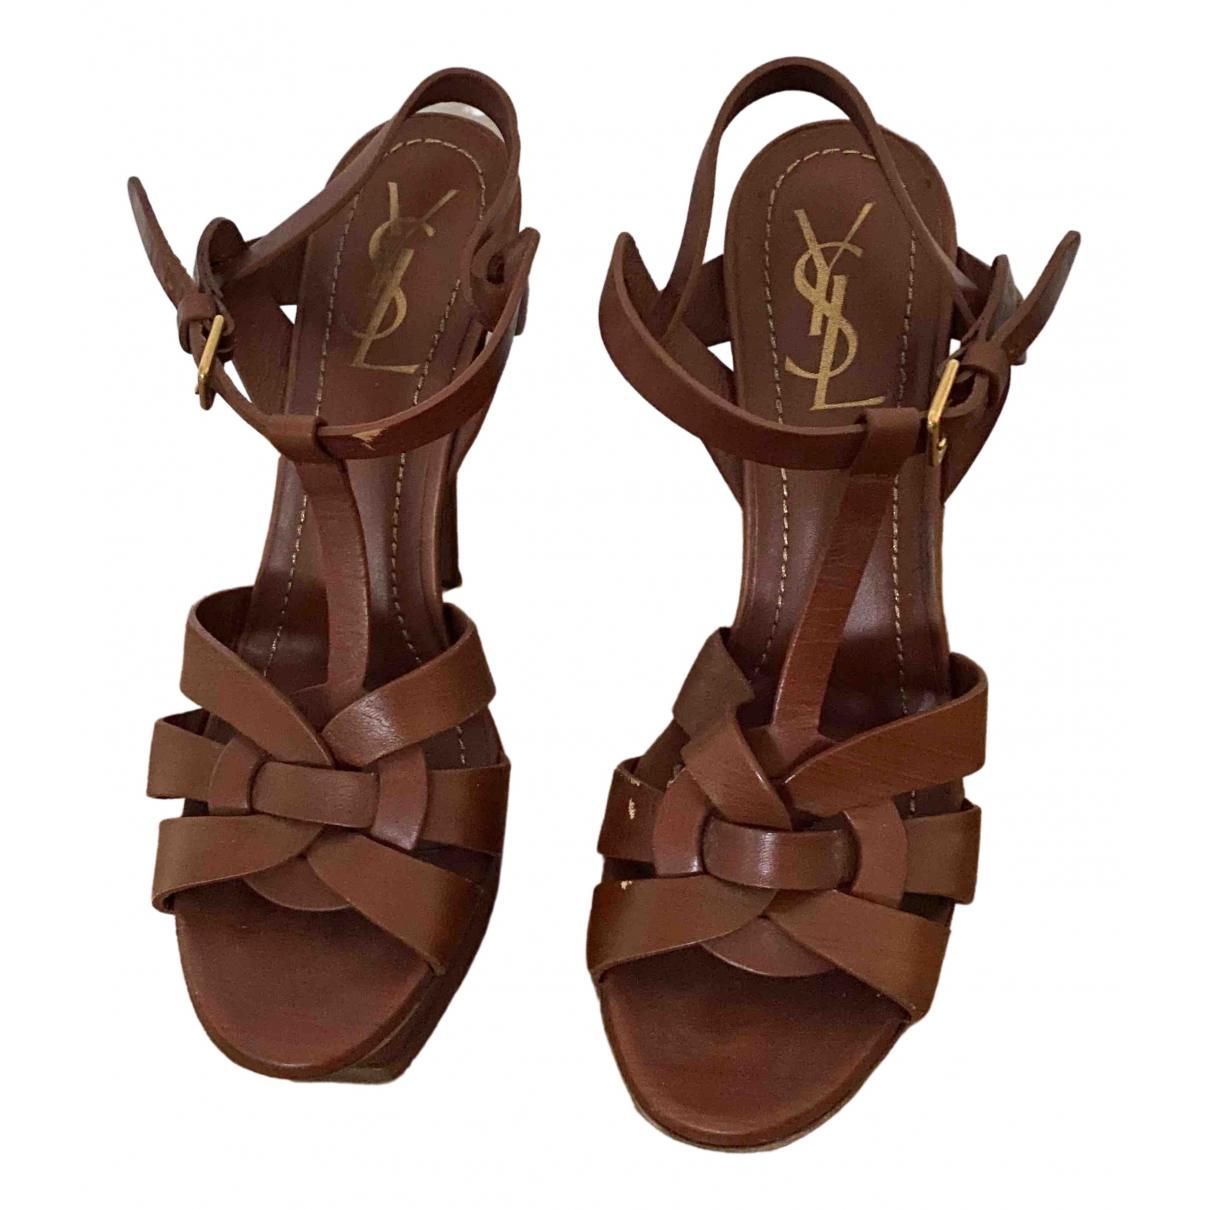 Yves Saint Laurent Tribute Camel Leather Sandals for Women 39 EU